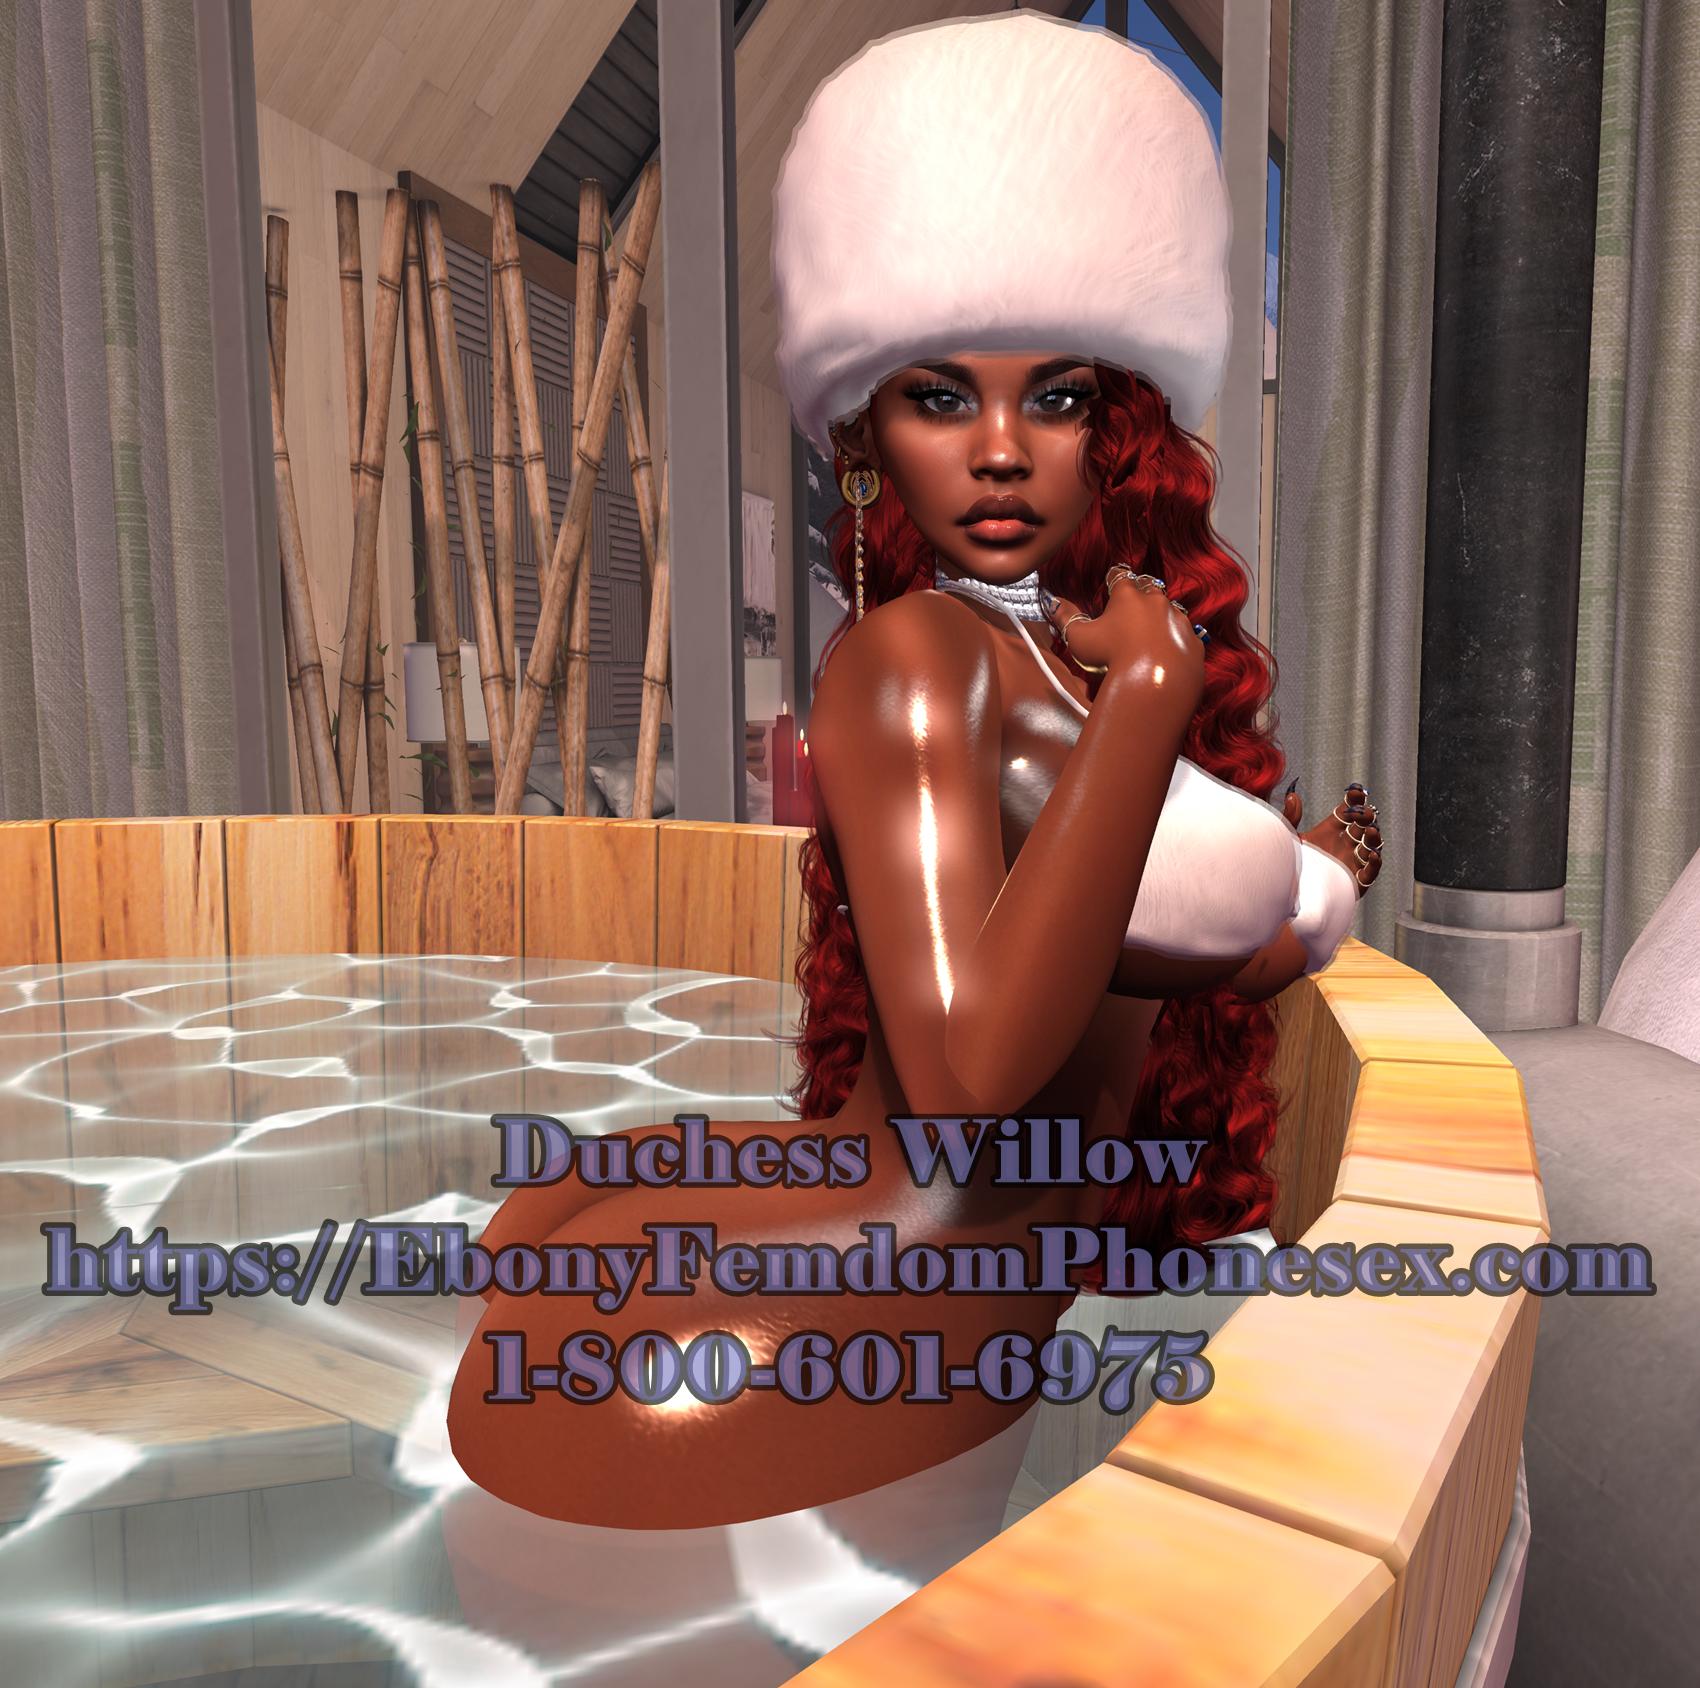 Ebony Femdom Mistletoe